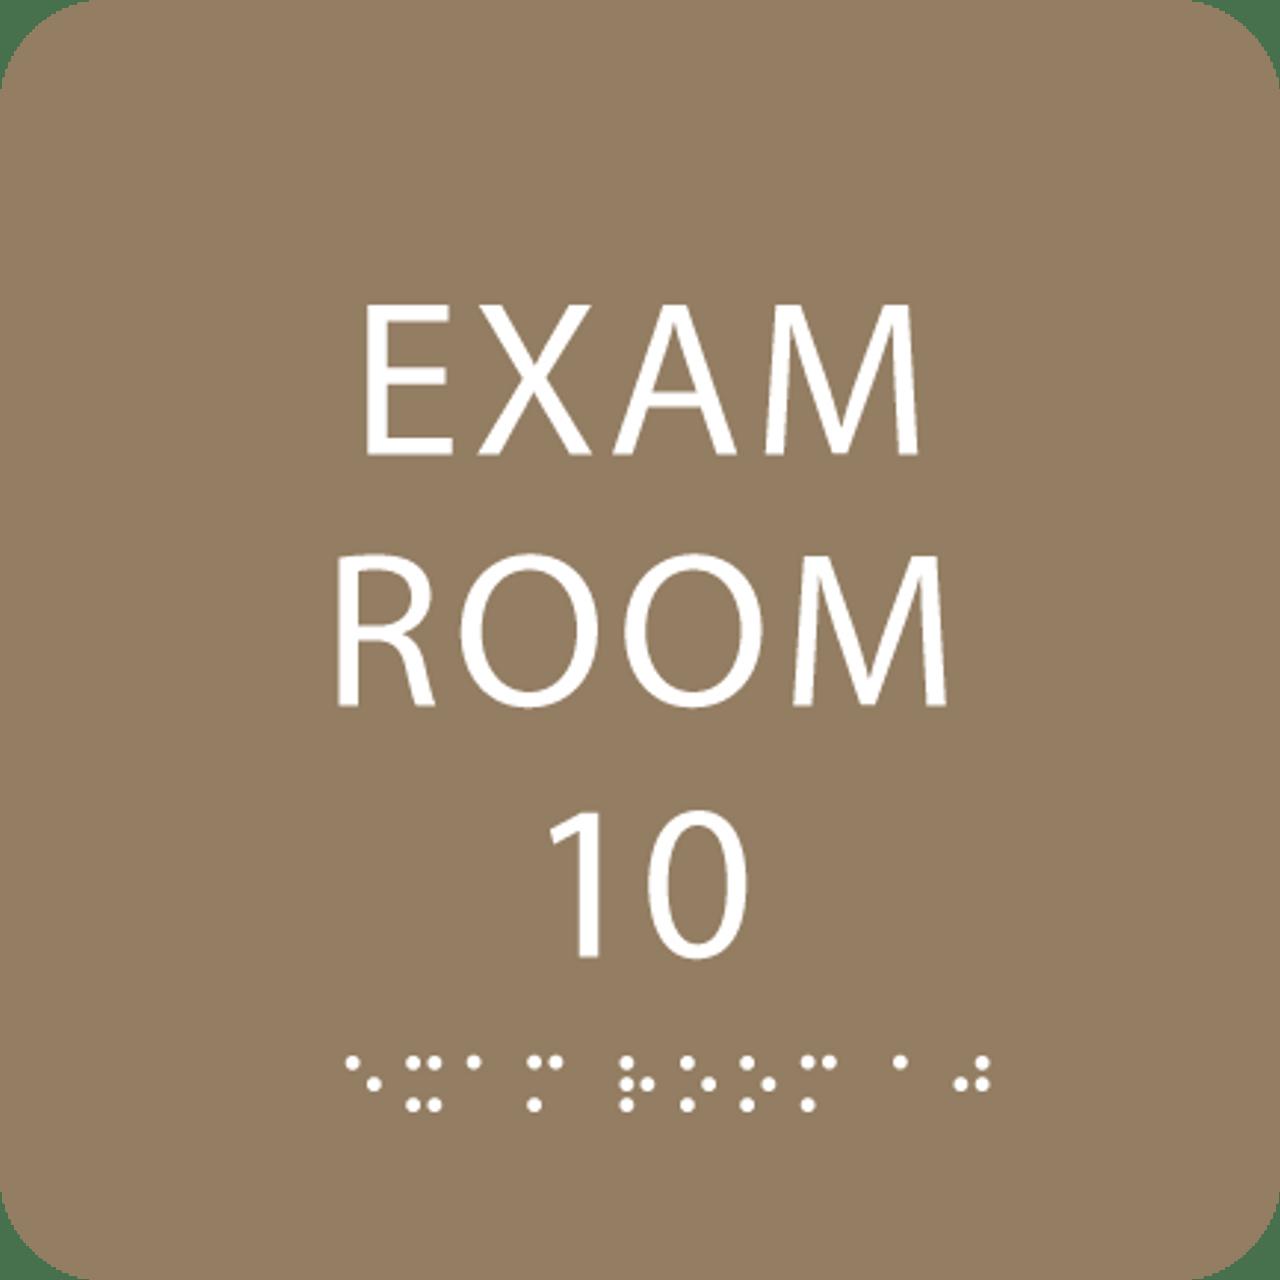 Light Brown Exam Room 10 Sign w/ ADA Braille